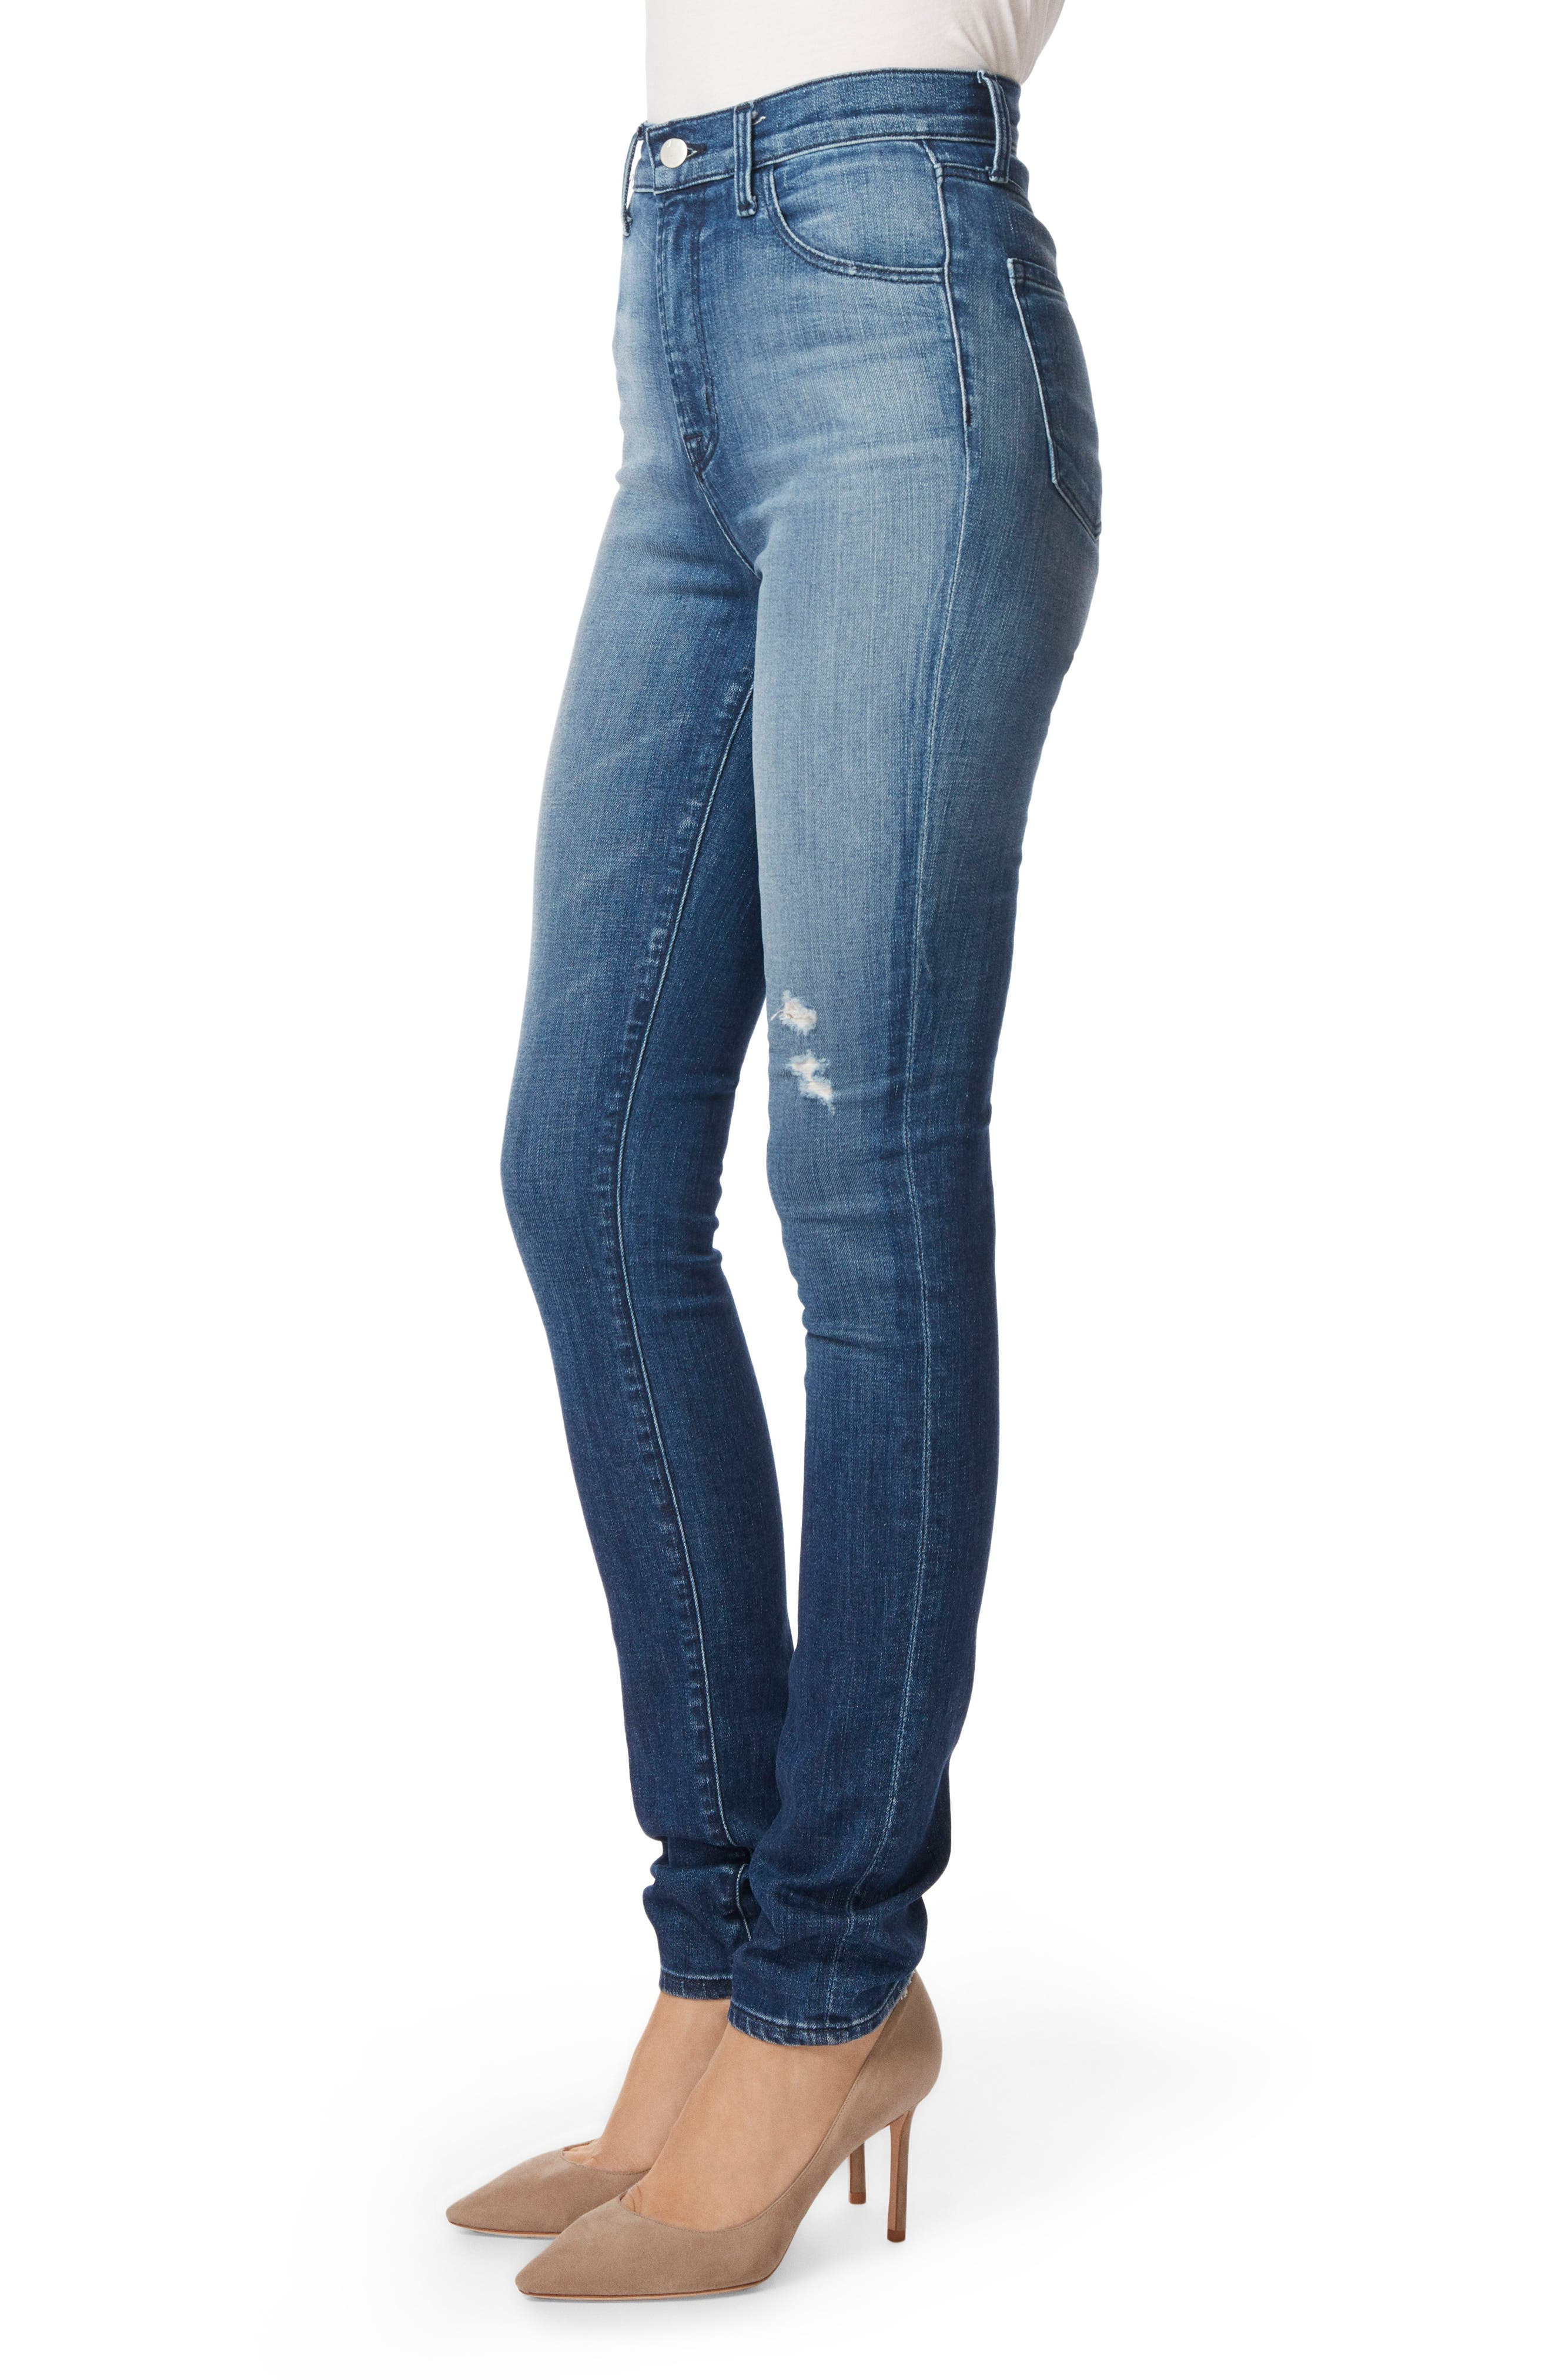 Carolina Super High Waist Skinny Jeans,                             Alternate thumbnail 3, color,                             Mystic